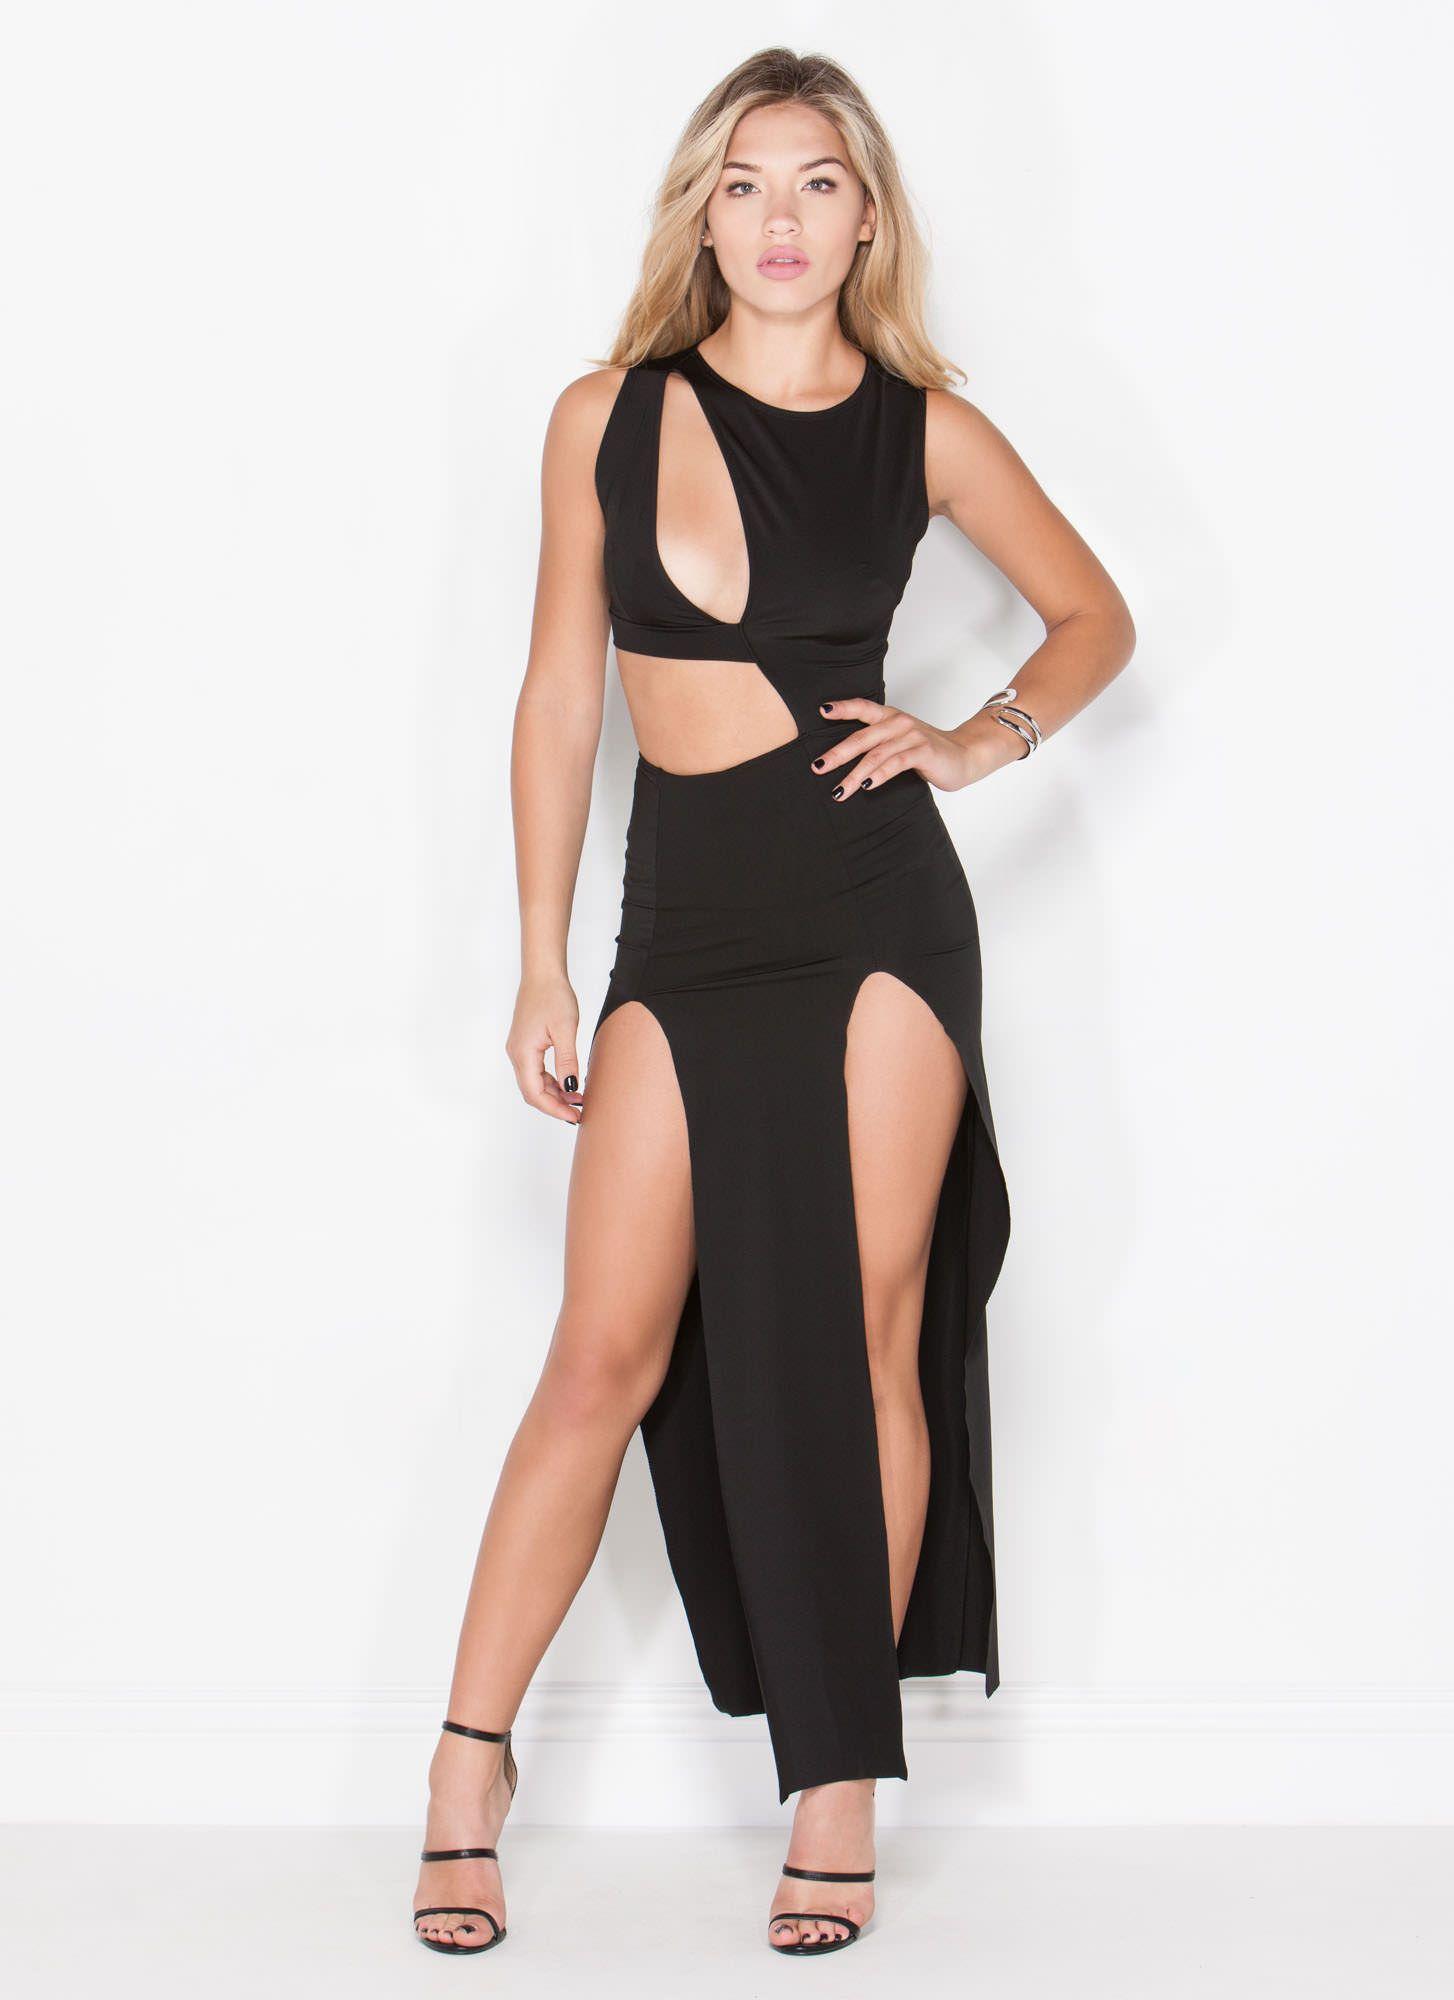 Supermodel Strut Cut-Out Maxi Dress BLACK | Night Out | Pinterest ...